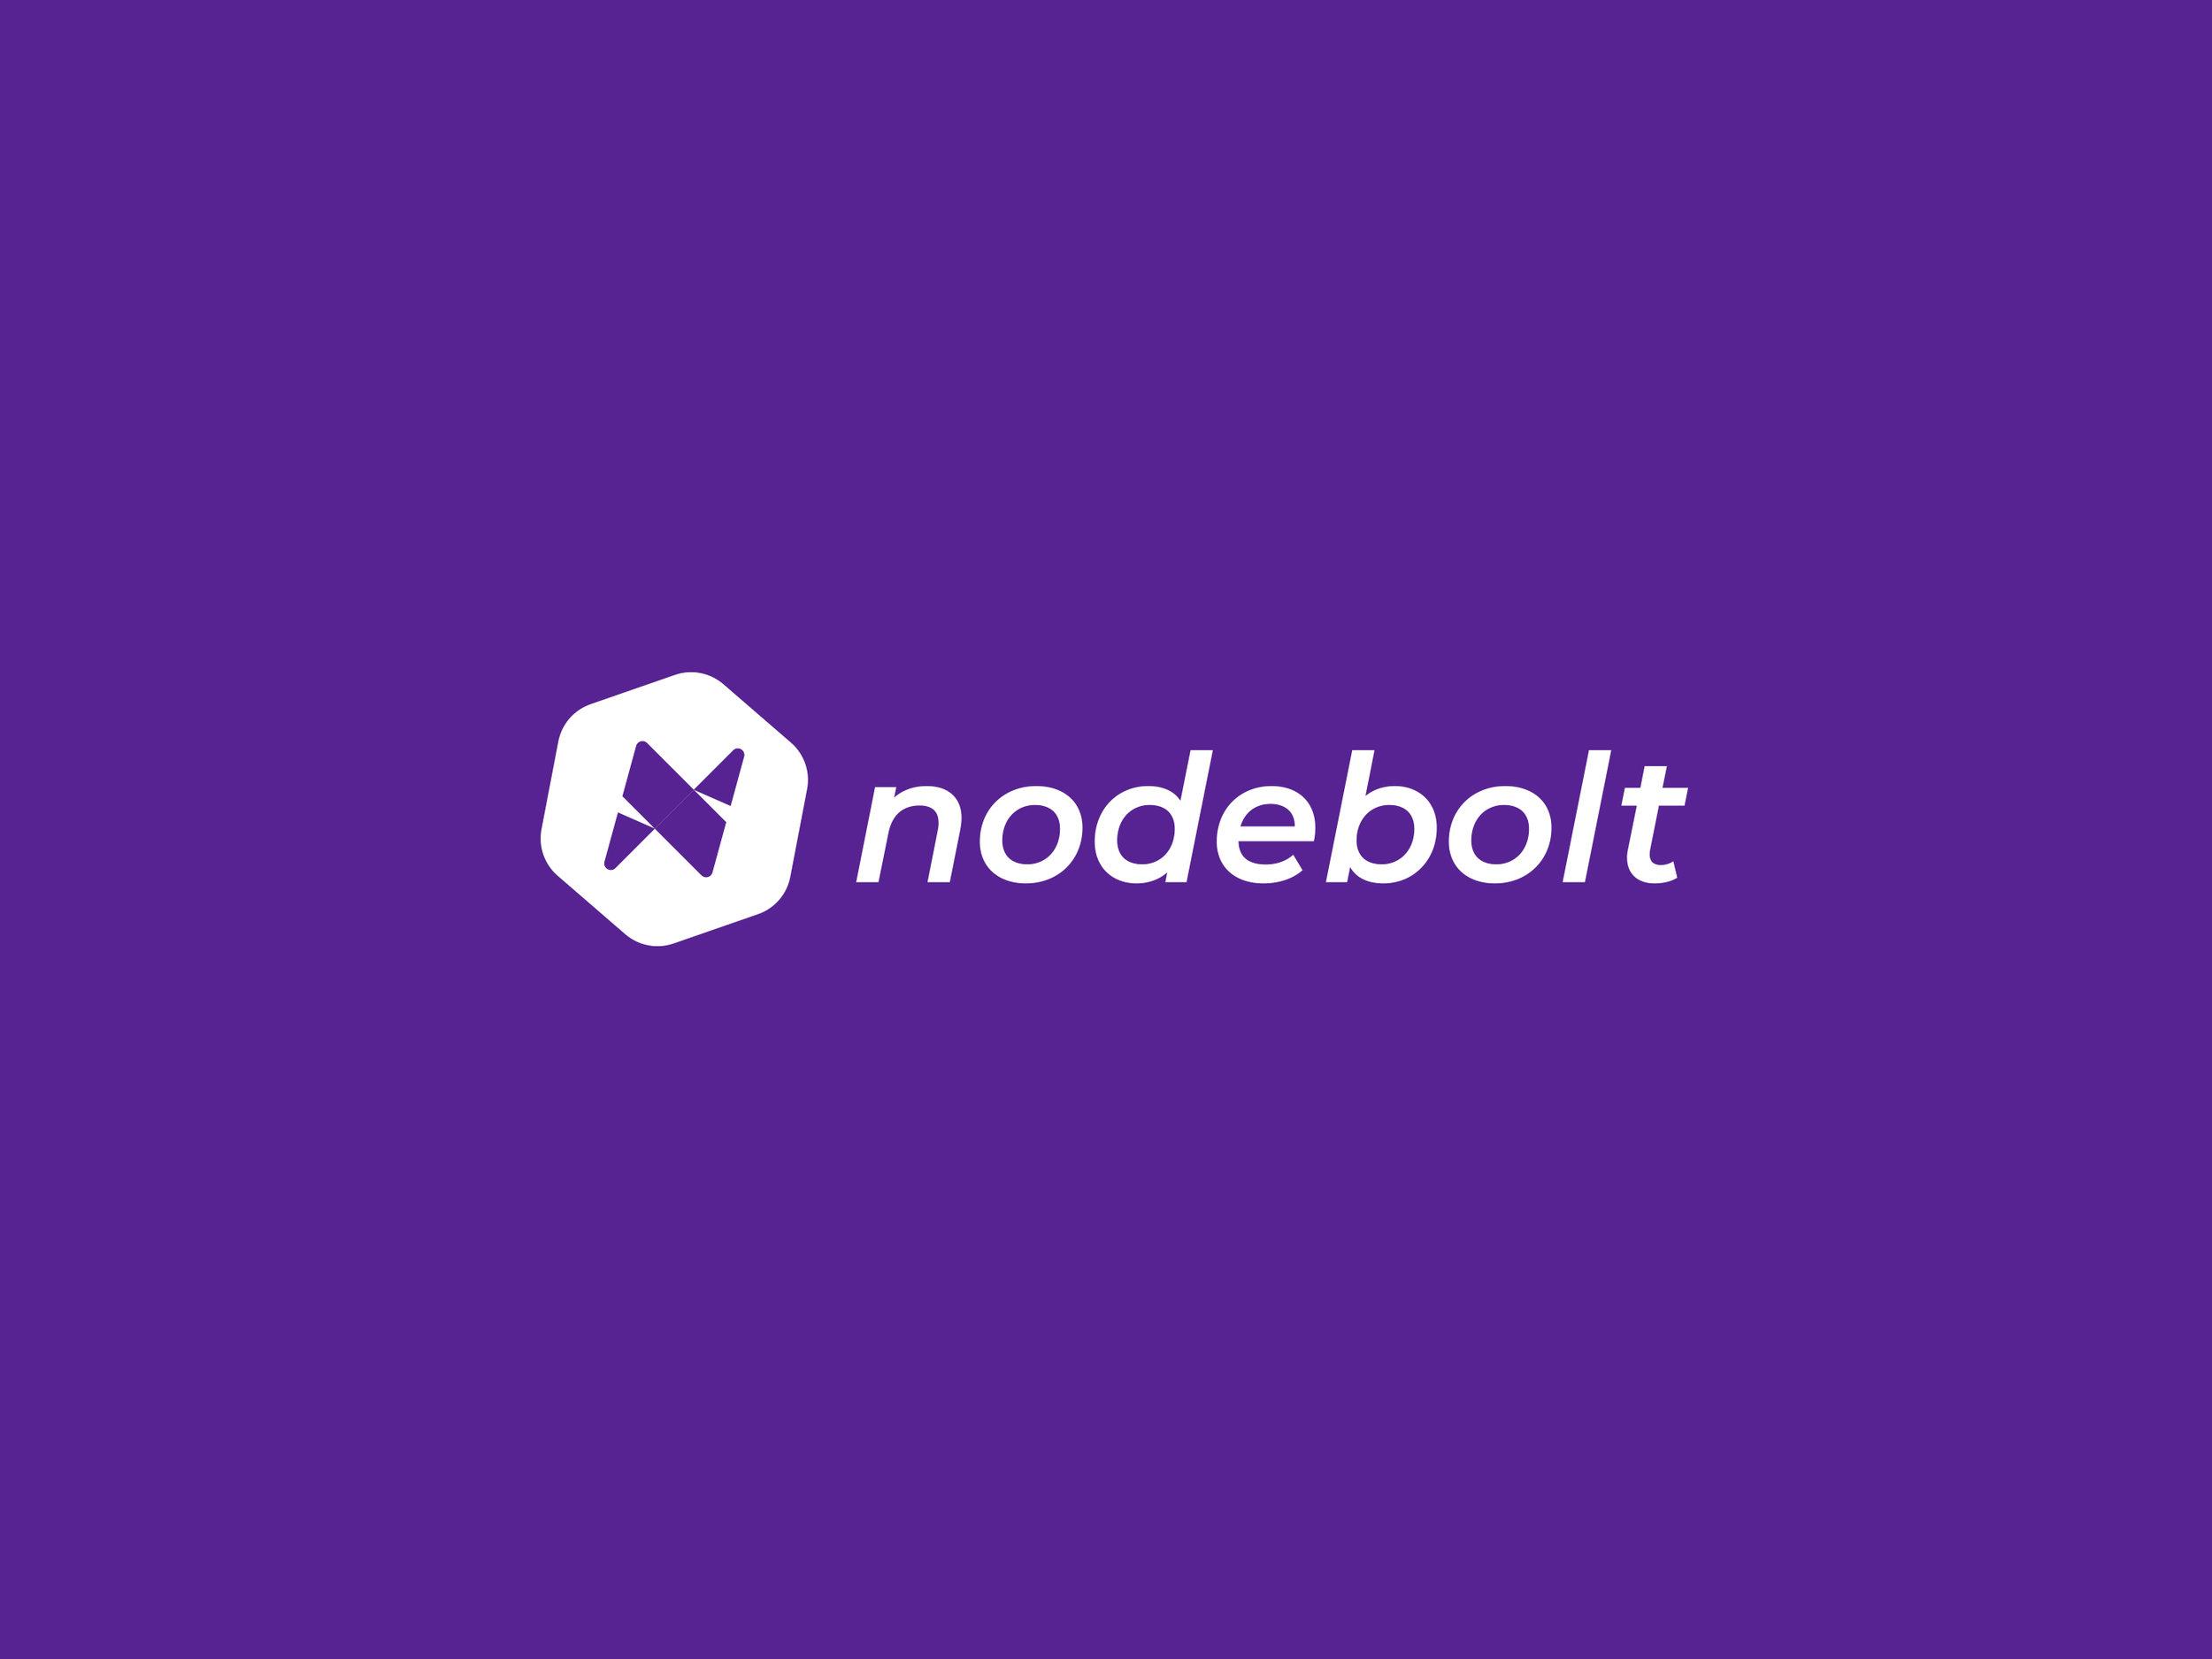 Nodebolt-Projectimage-01.jpg